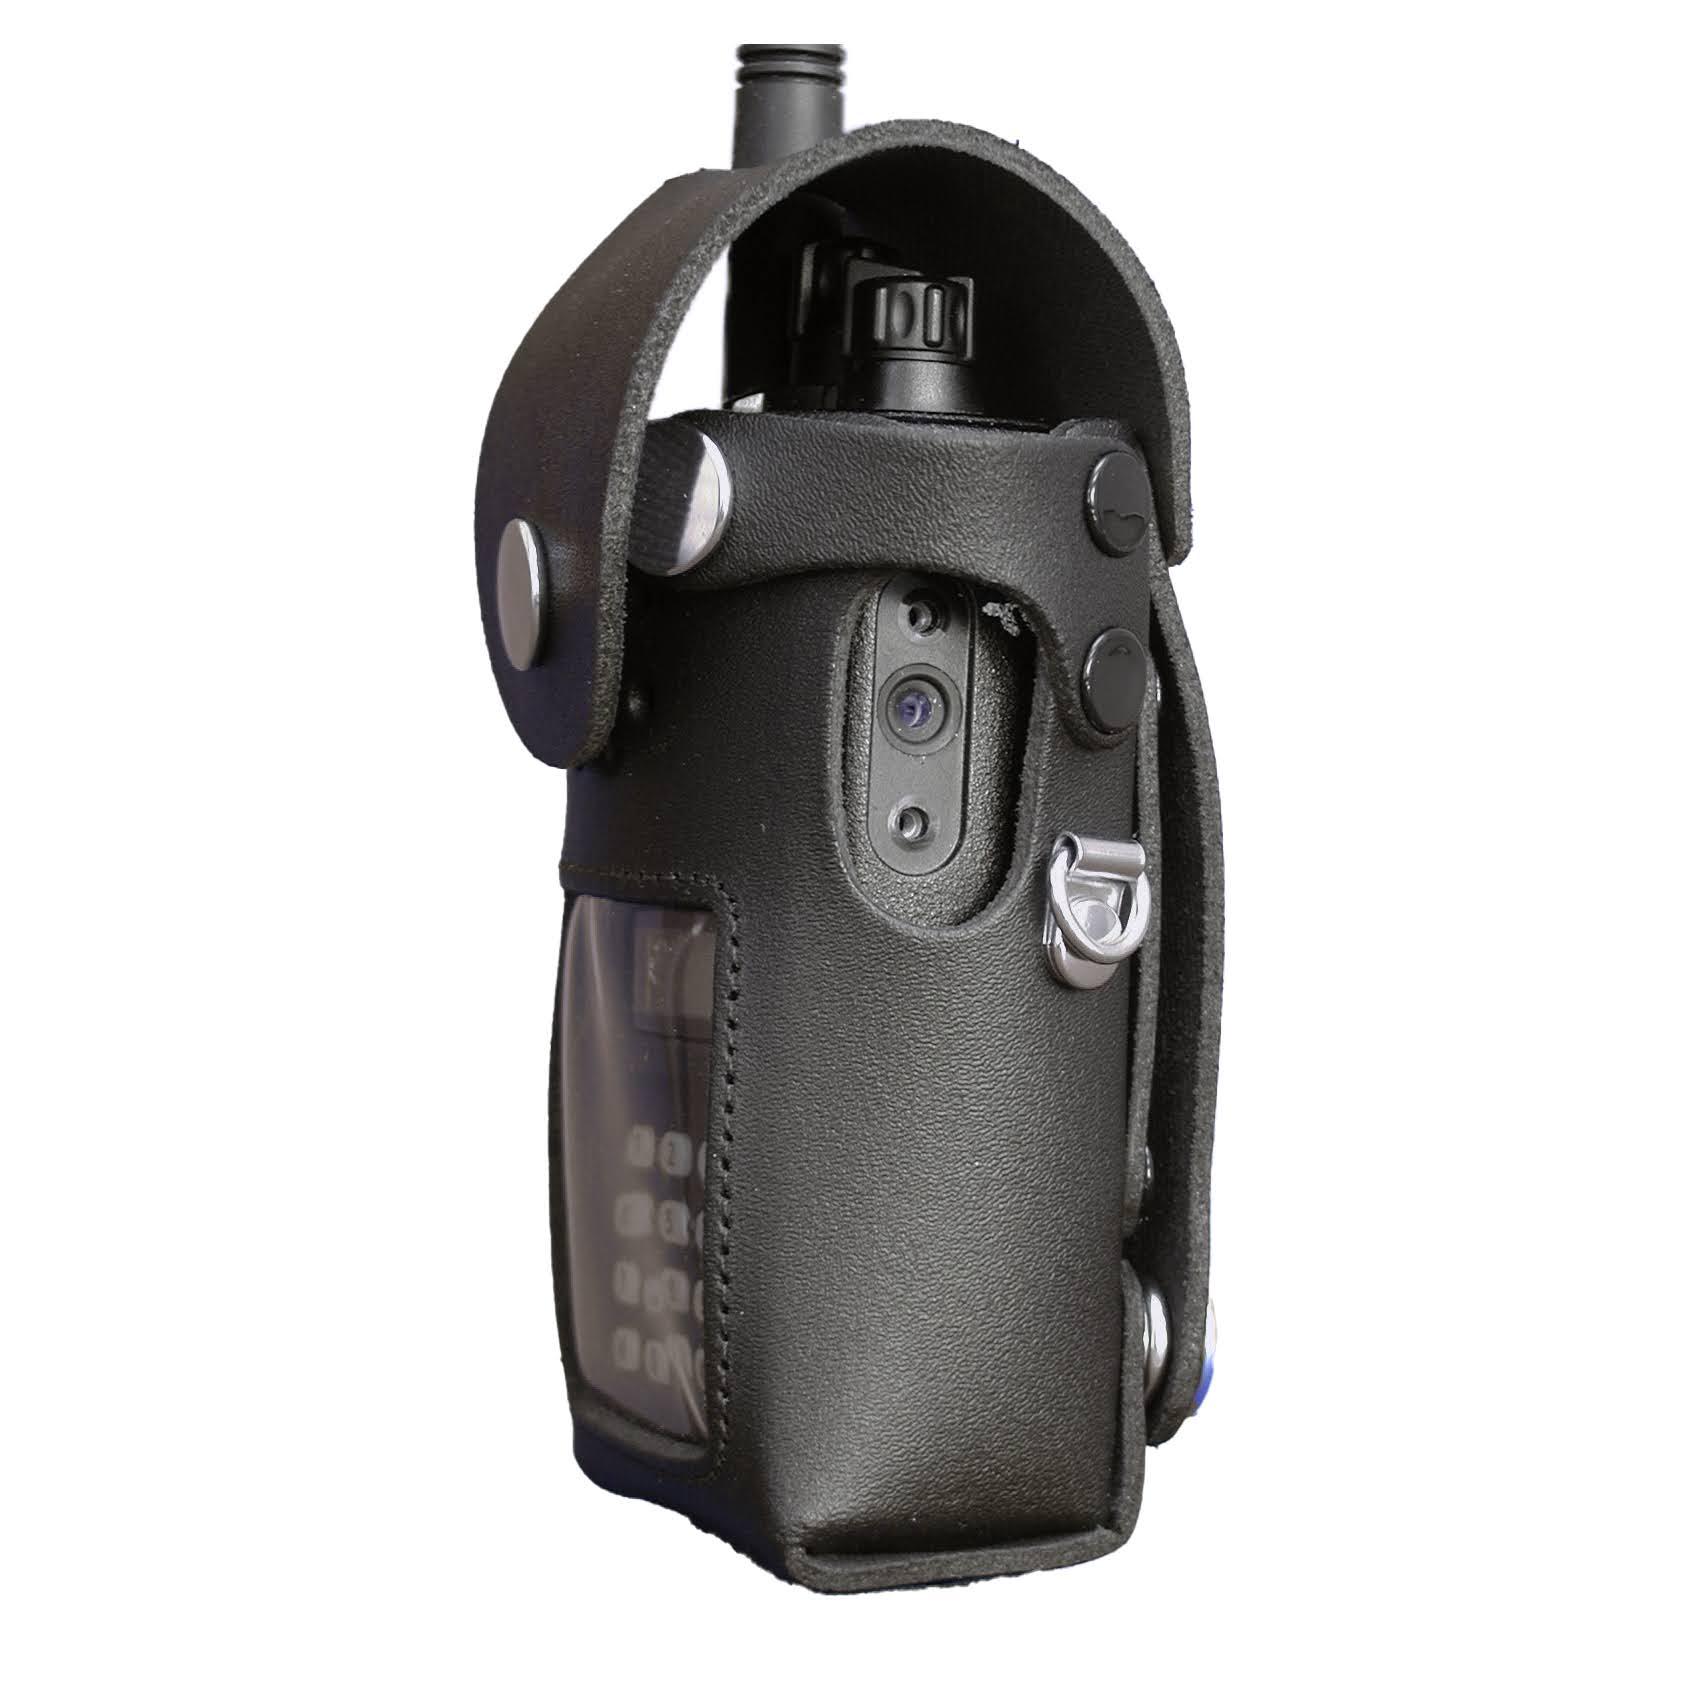 Vertex VX410 Leather Radio Case